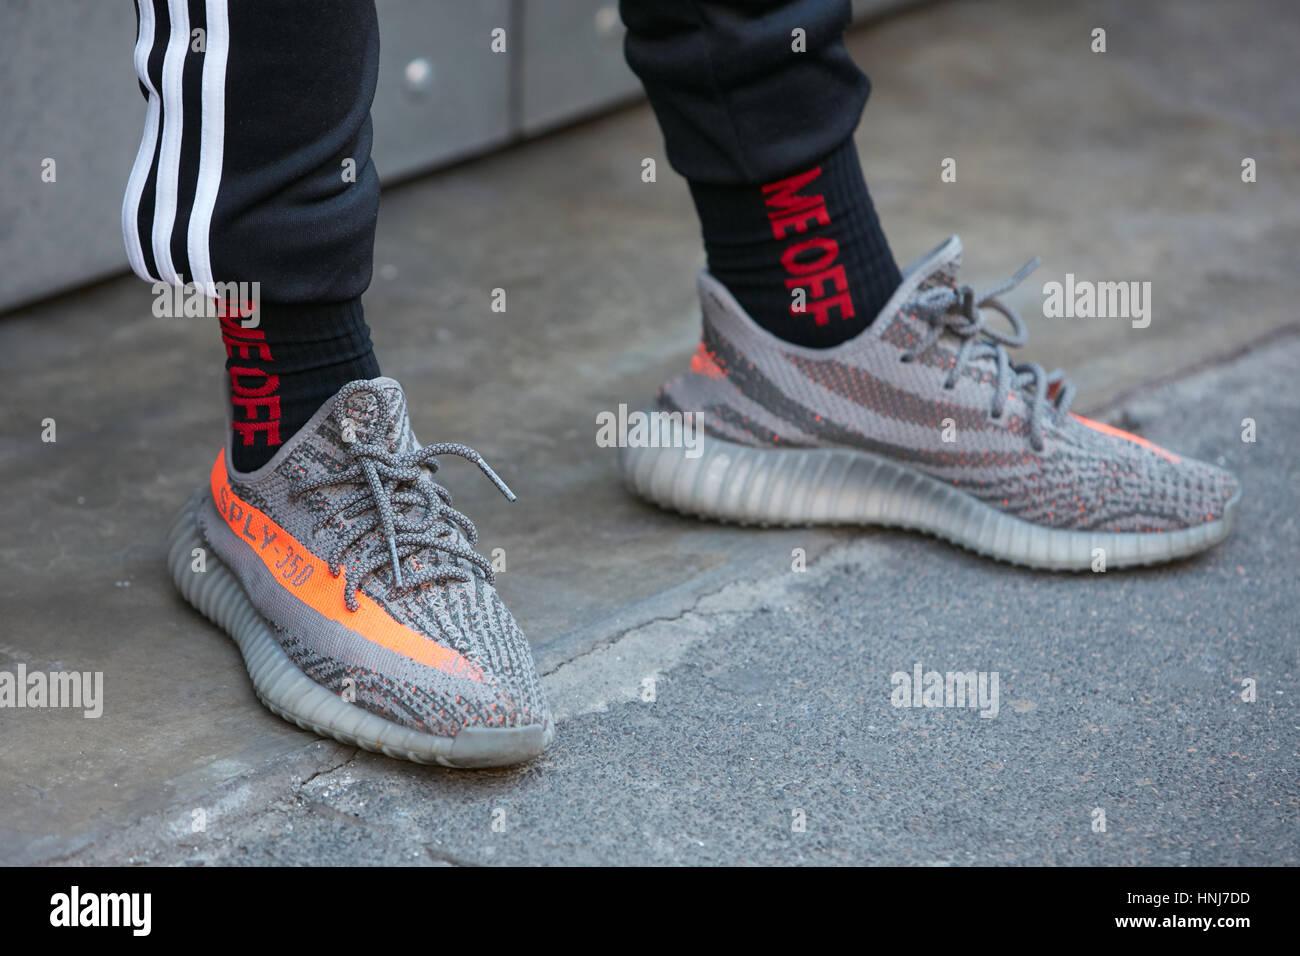 Avec Boost Avant Gris Yeezy 21 Adidas Homme Fashion N Chaussures 34AjL5R